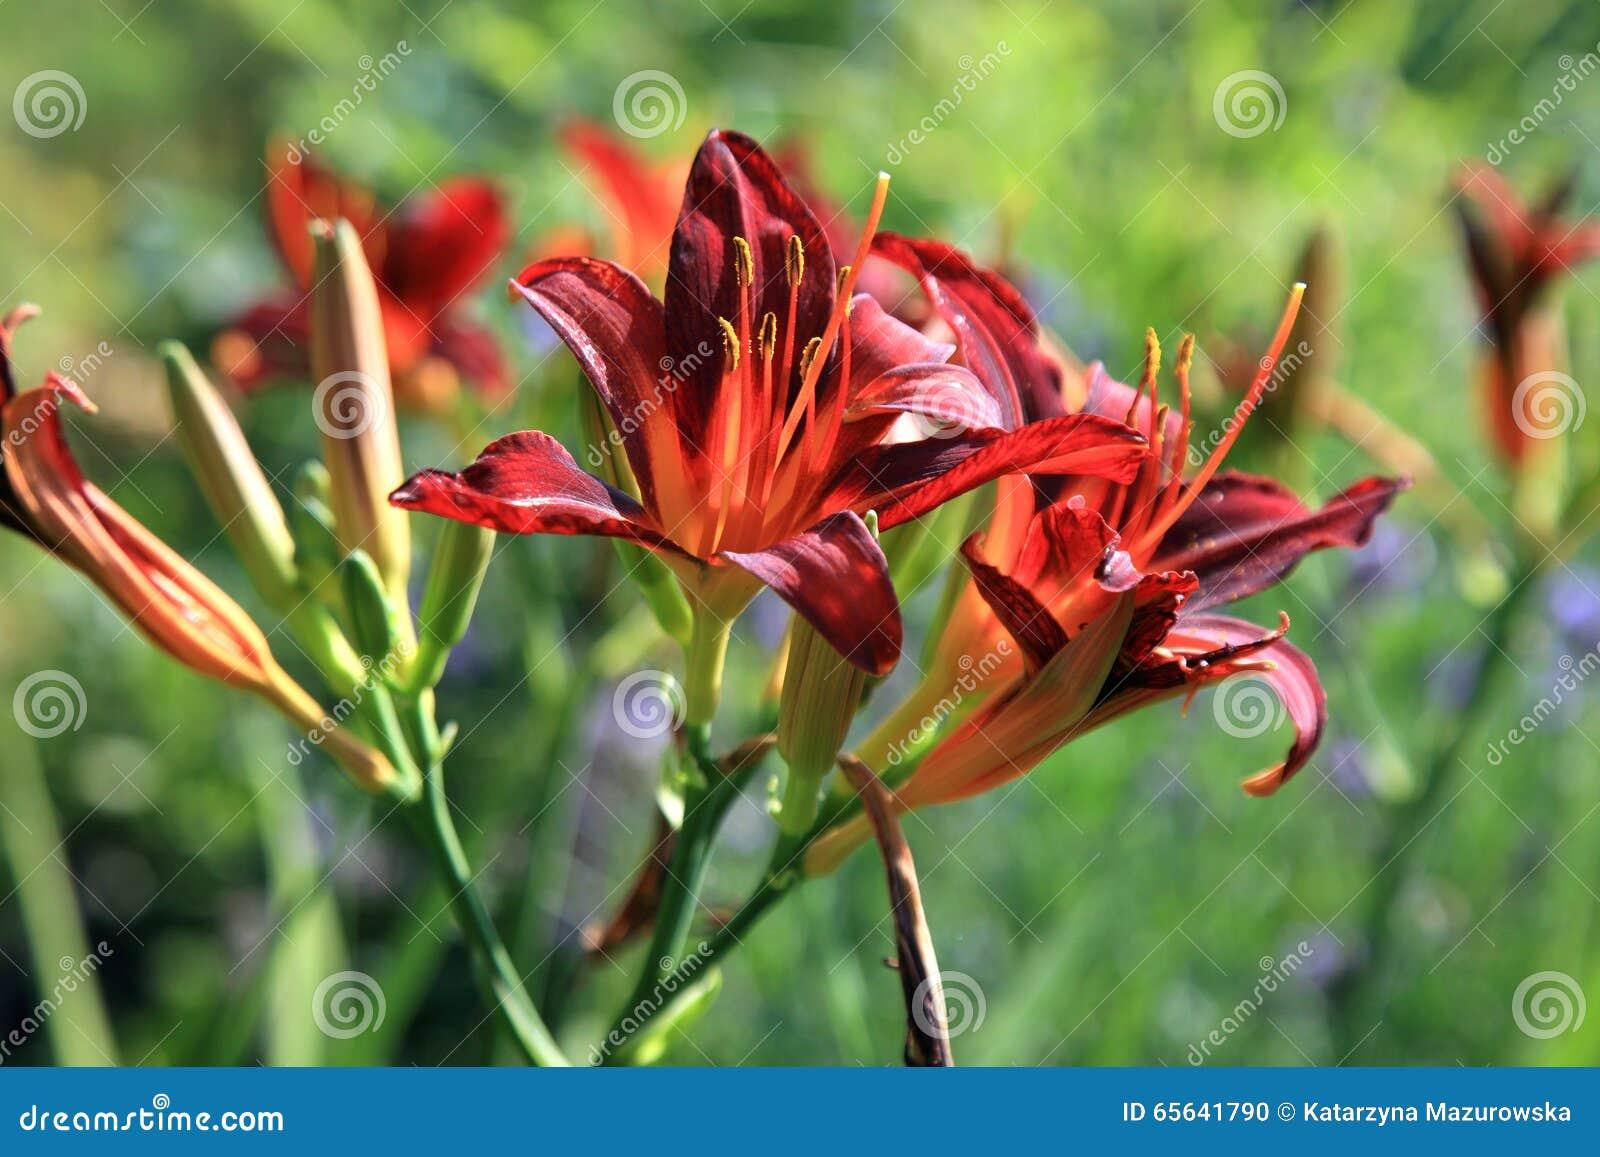 Daylilies de floraison - Hemerocallis